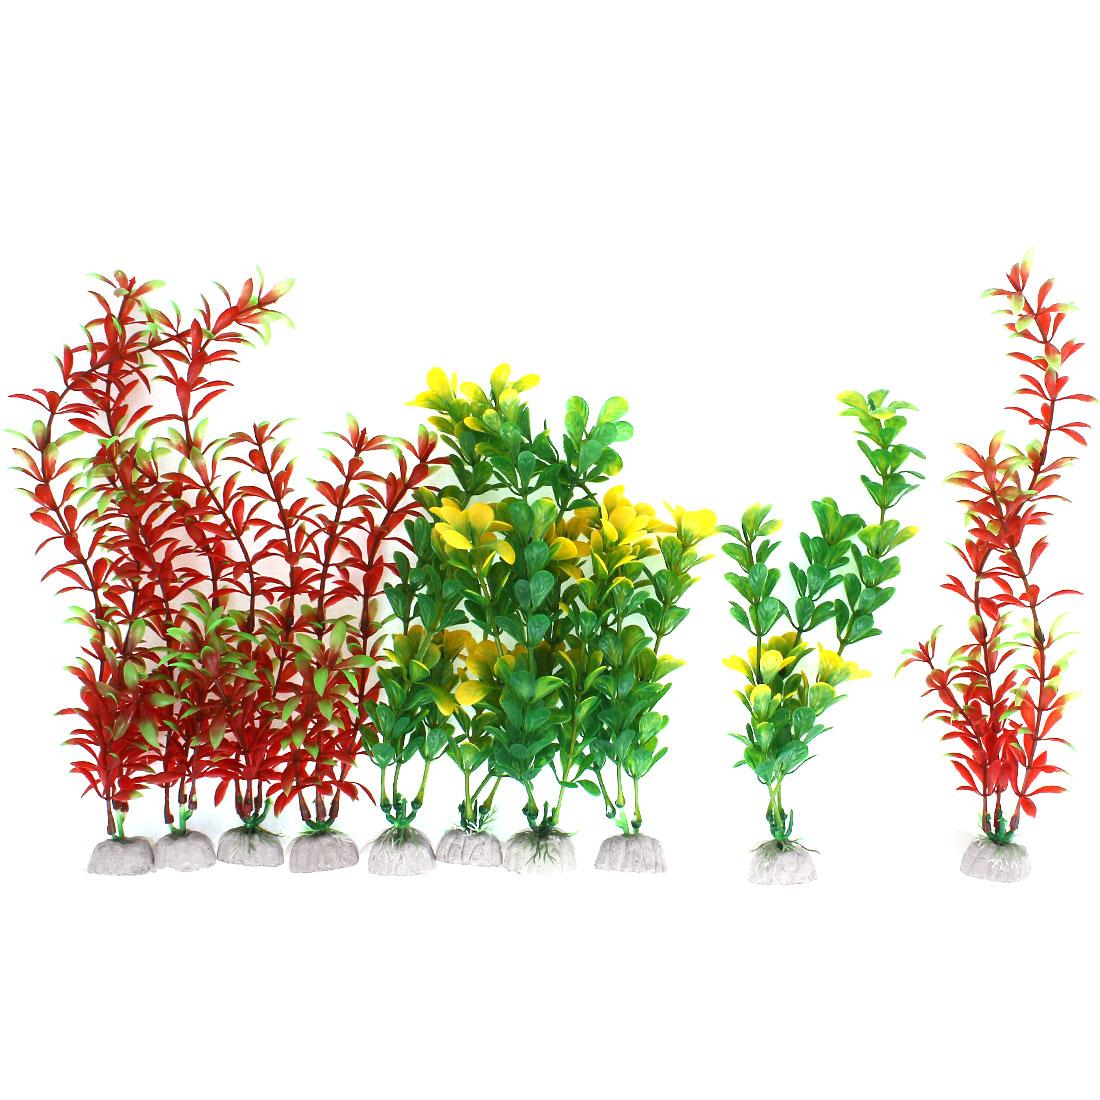 10 in 1 Fish Tank Aquarium Aquascaping Emulational Plastic Water Plant Crimson Yellow Green